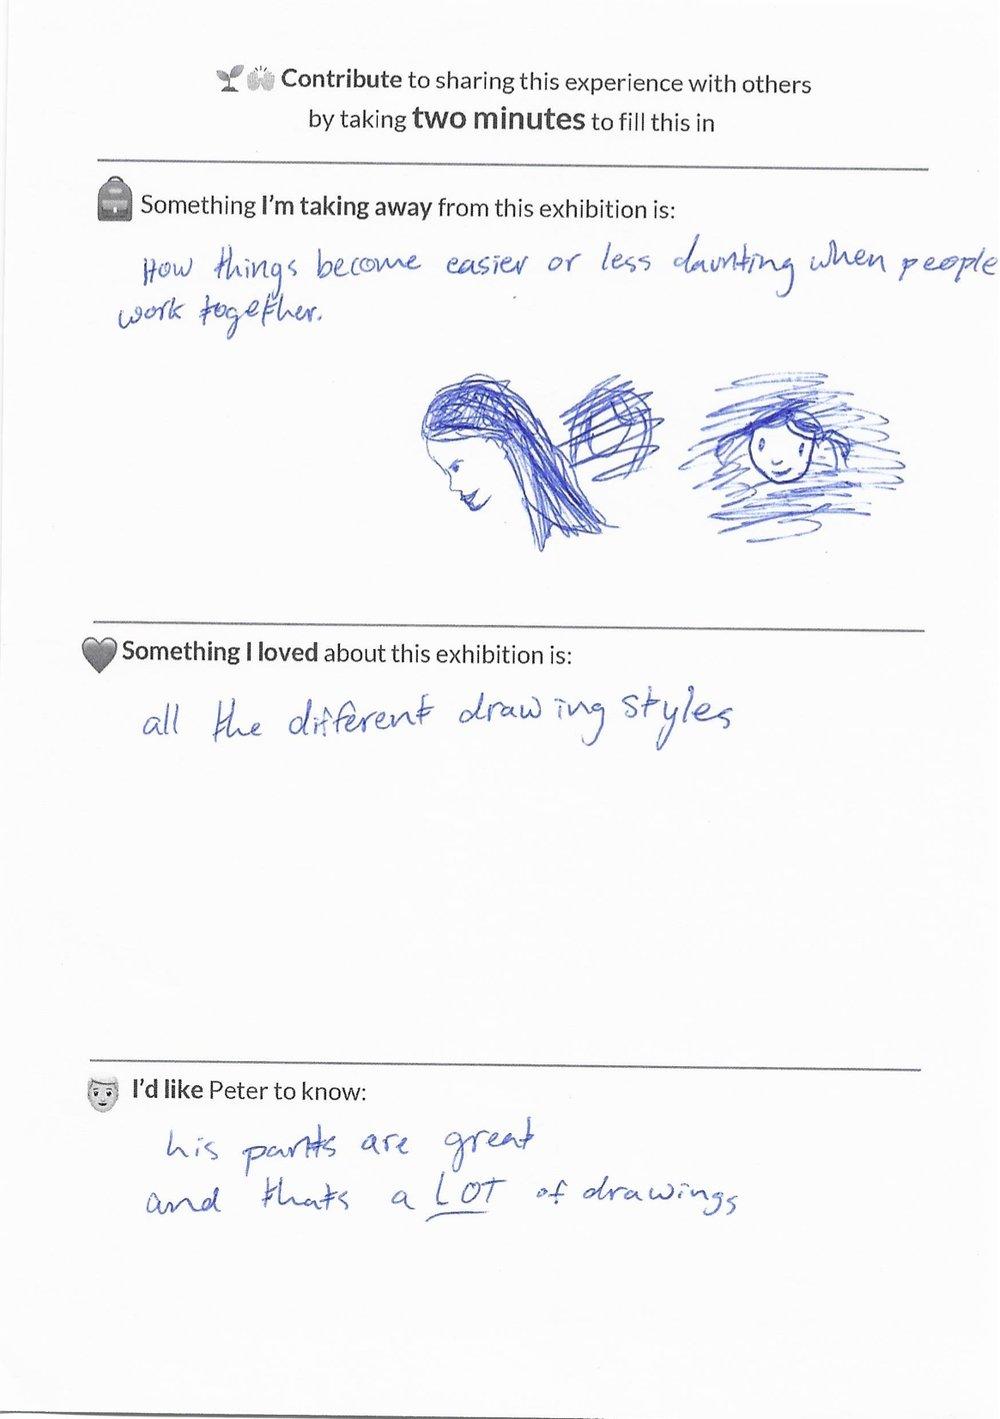 Drawn-in reflections-204.jpg